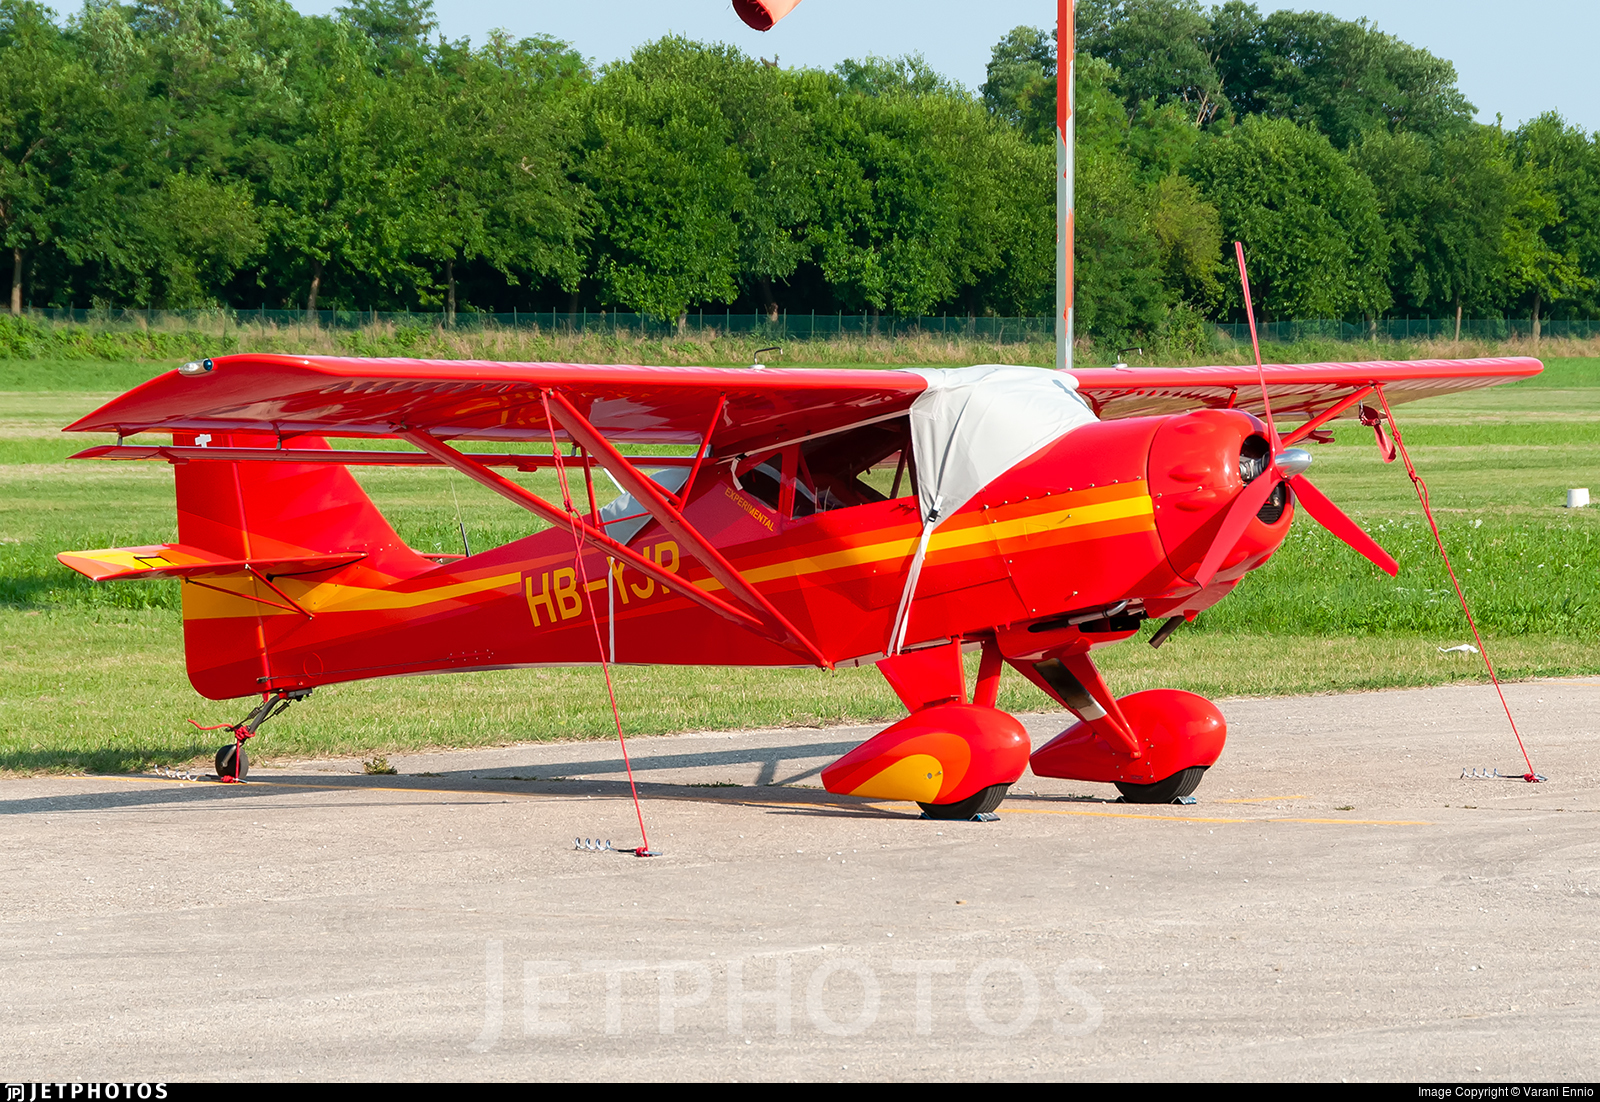 HB-YJP - Denney Kitfox IV-1200 Speedster - Private